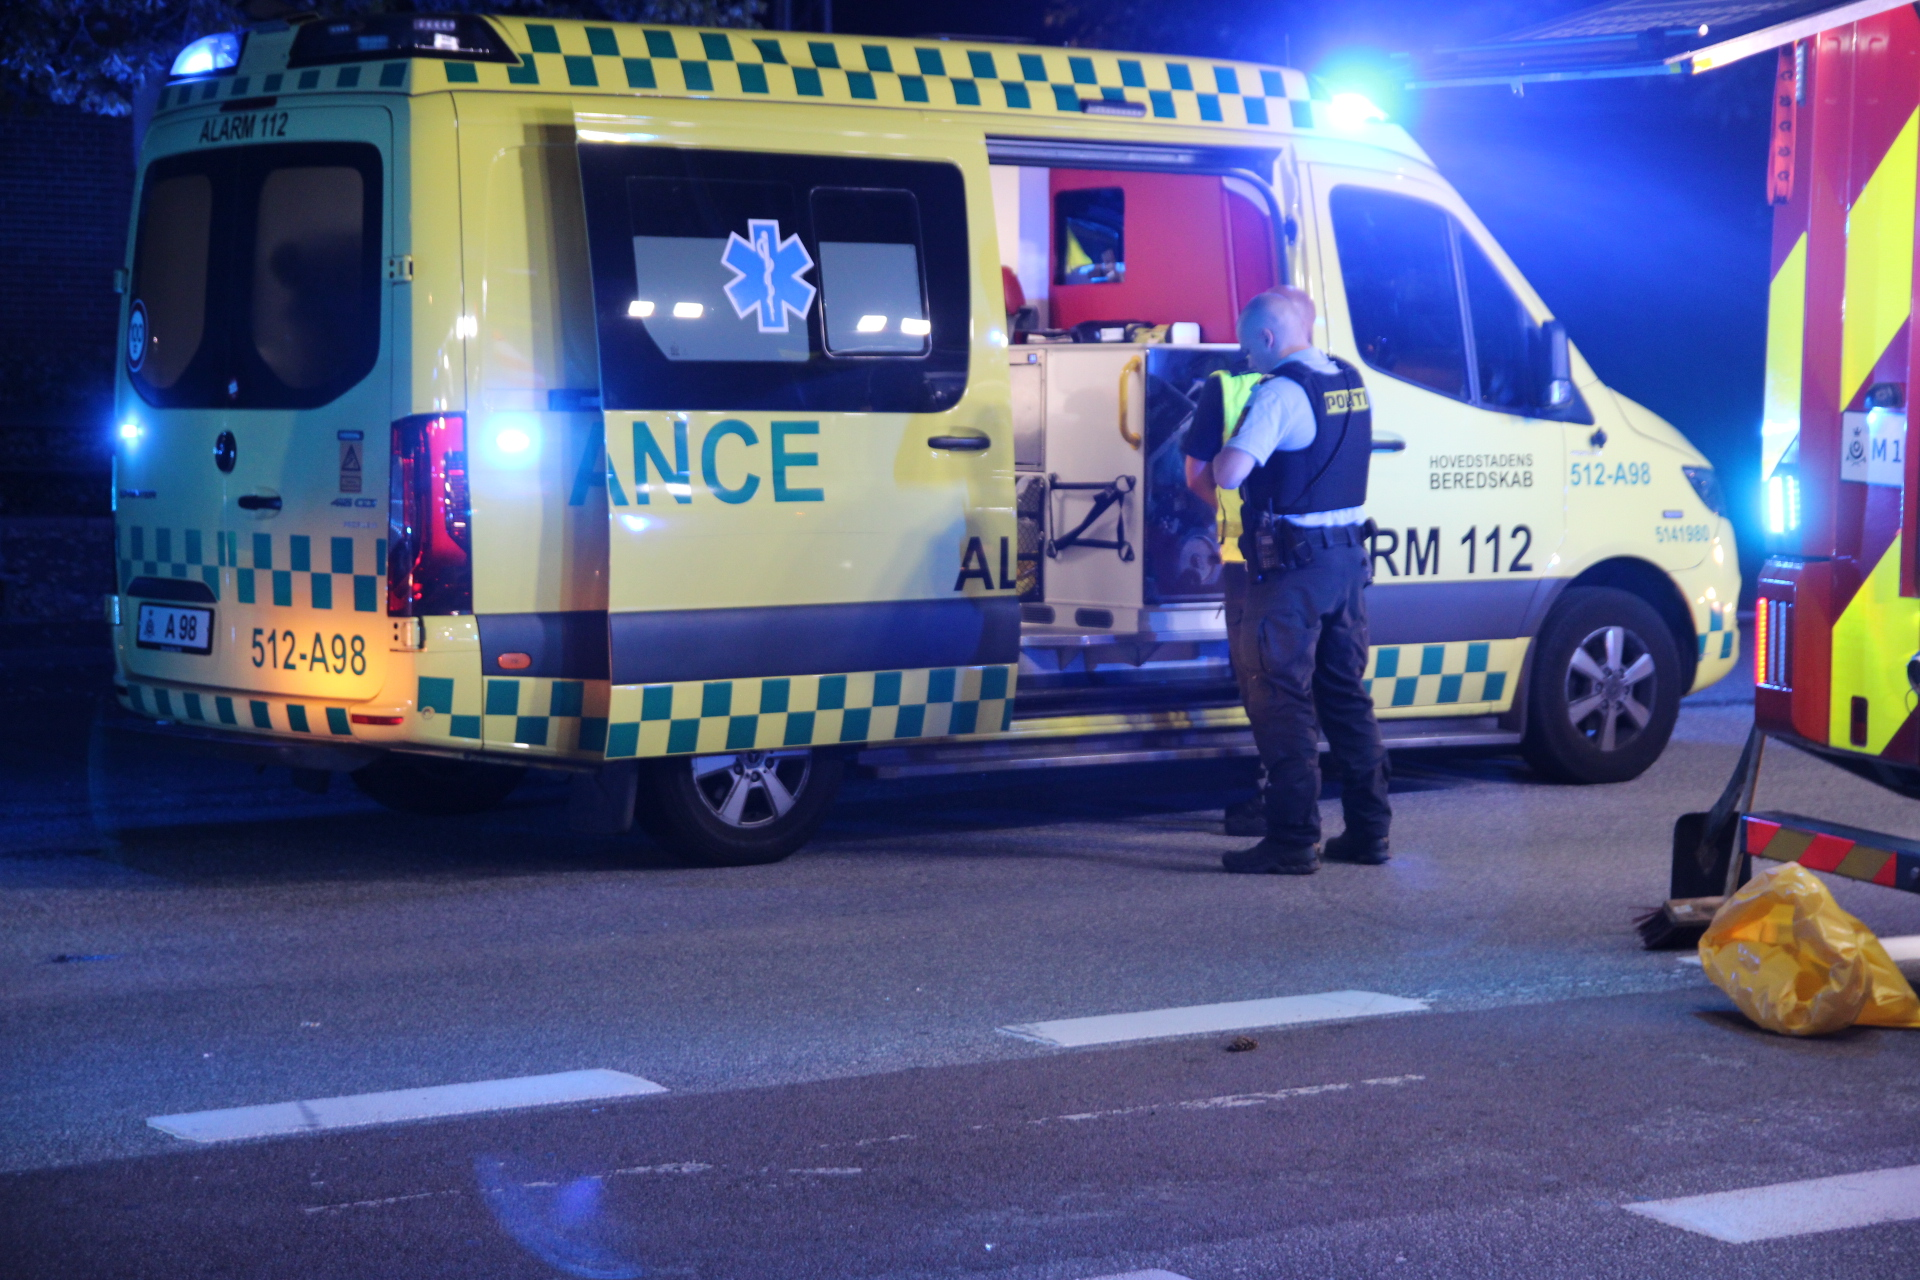 Alvorlig trafikulykke i København